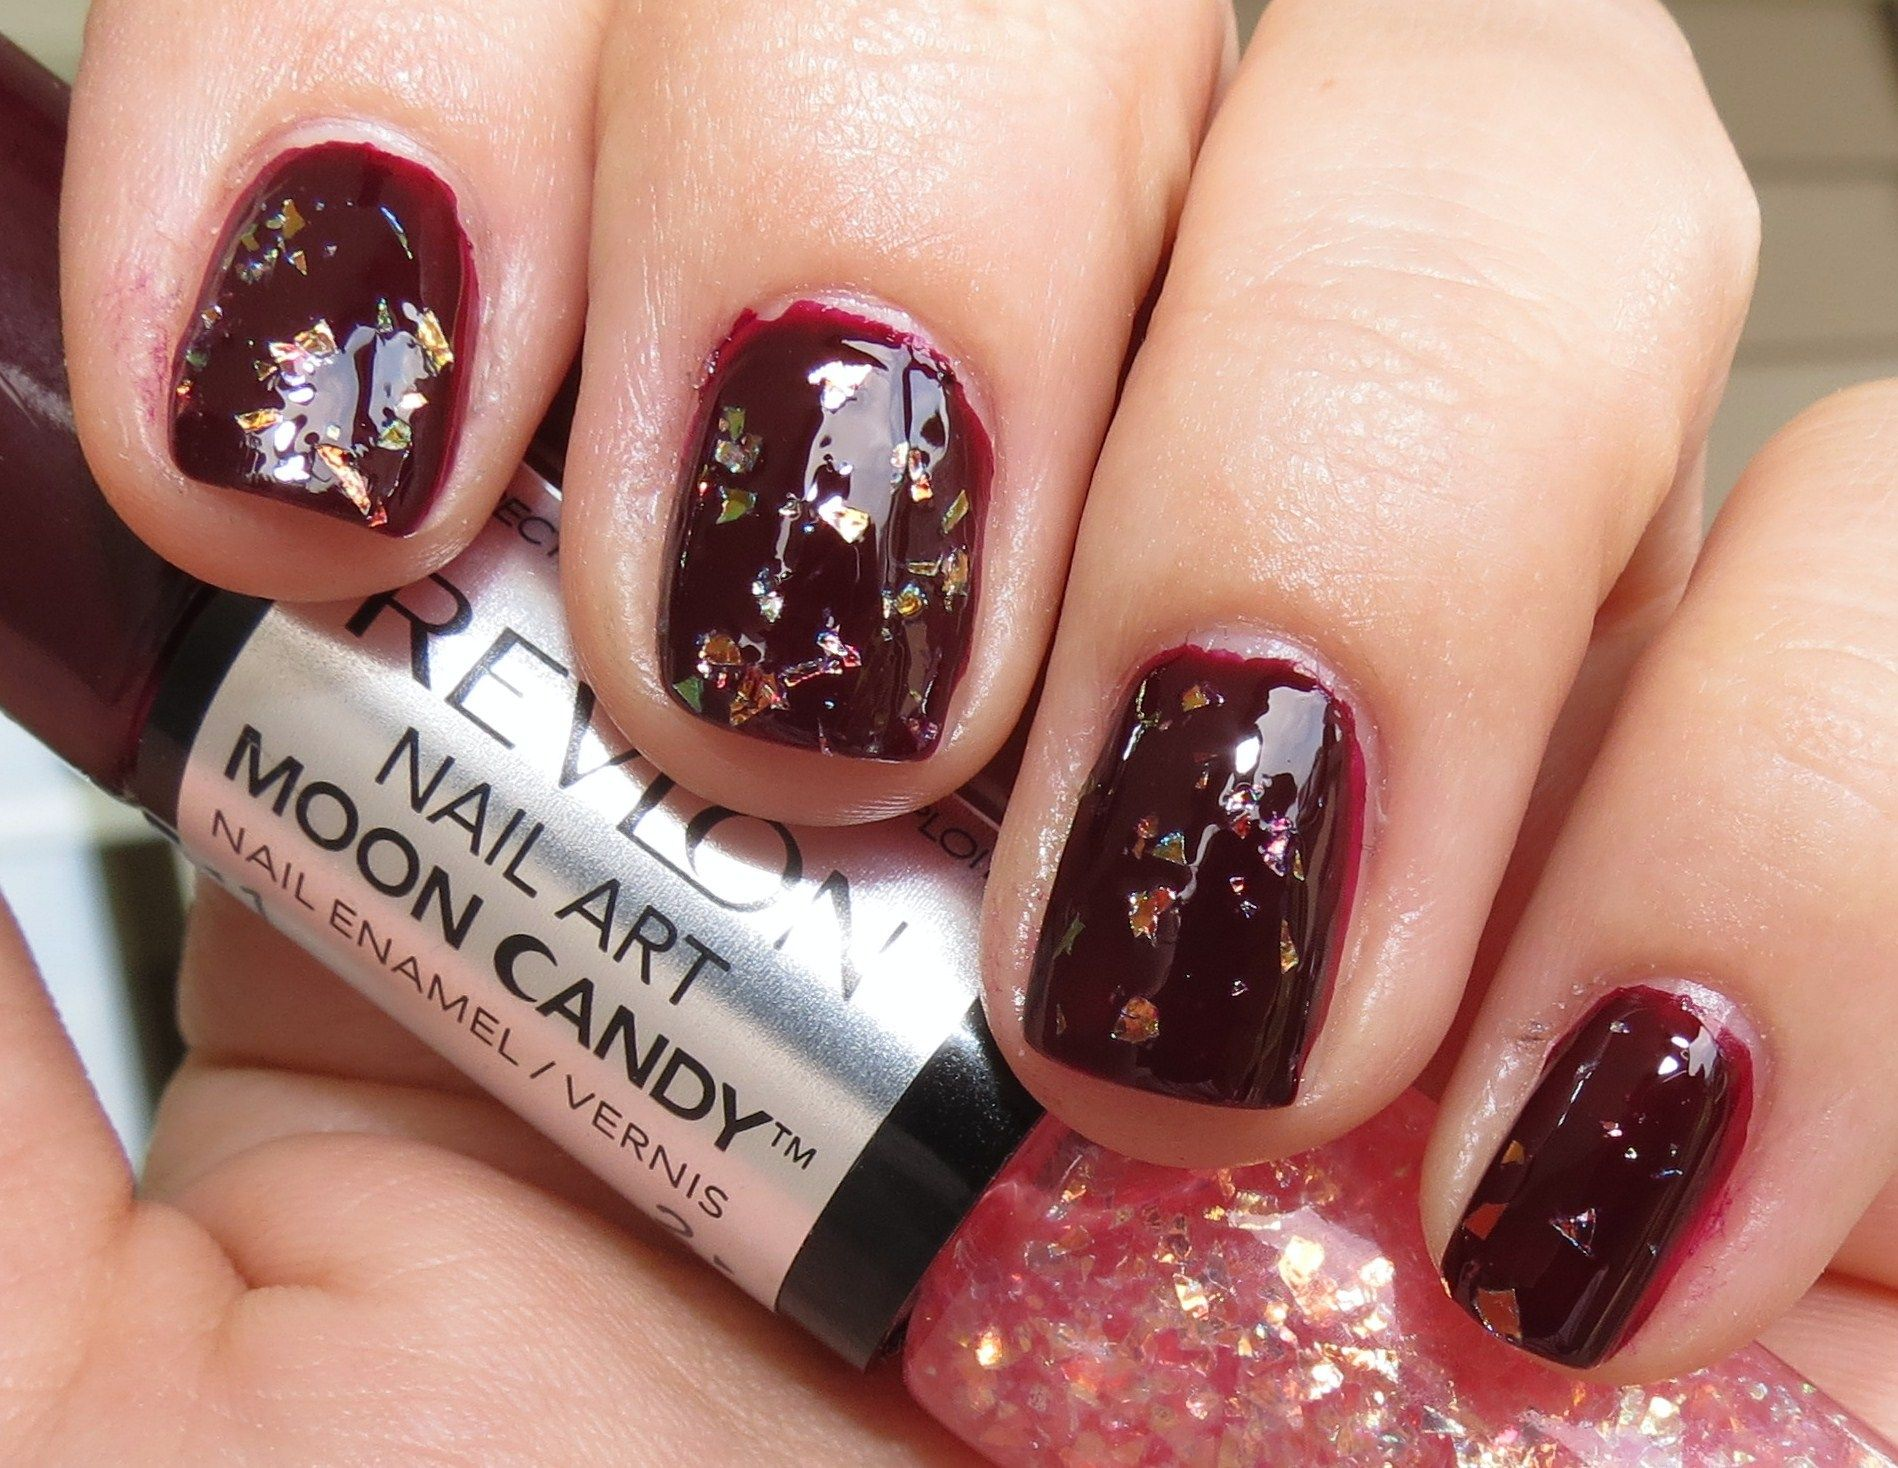 Revlon SATELLITE Nail Art Moon Candy Nail Enamel Swatches & Review ...